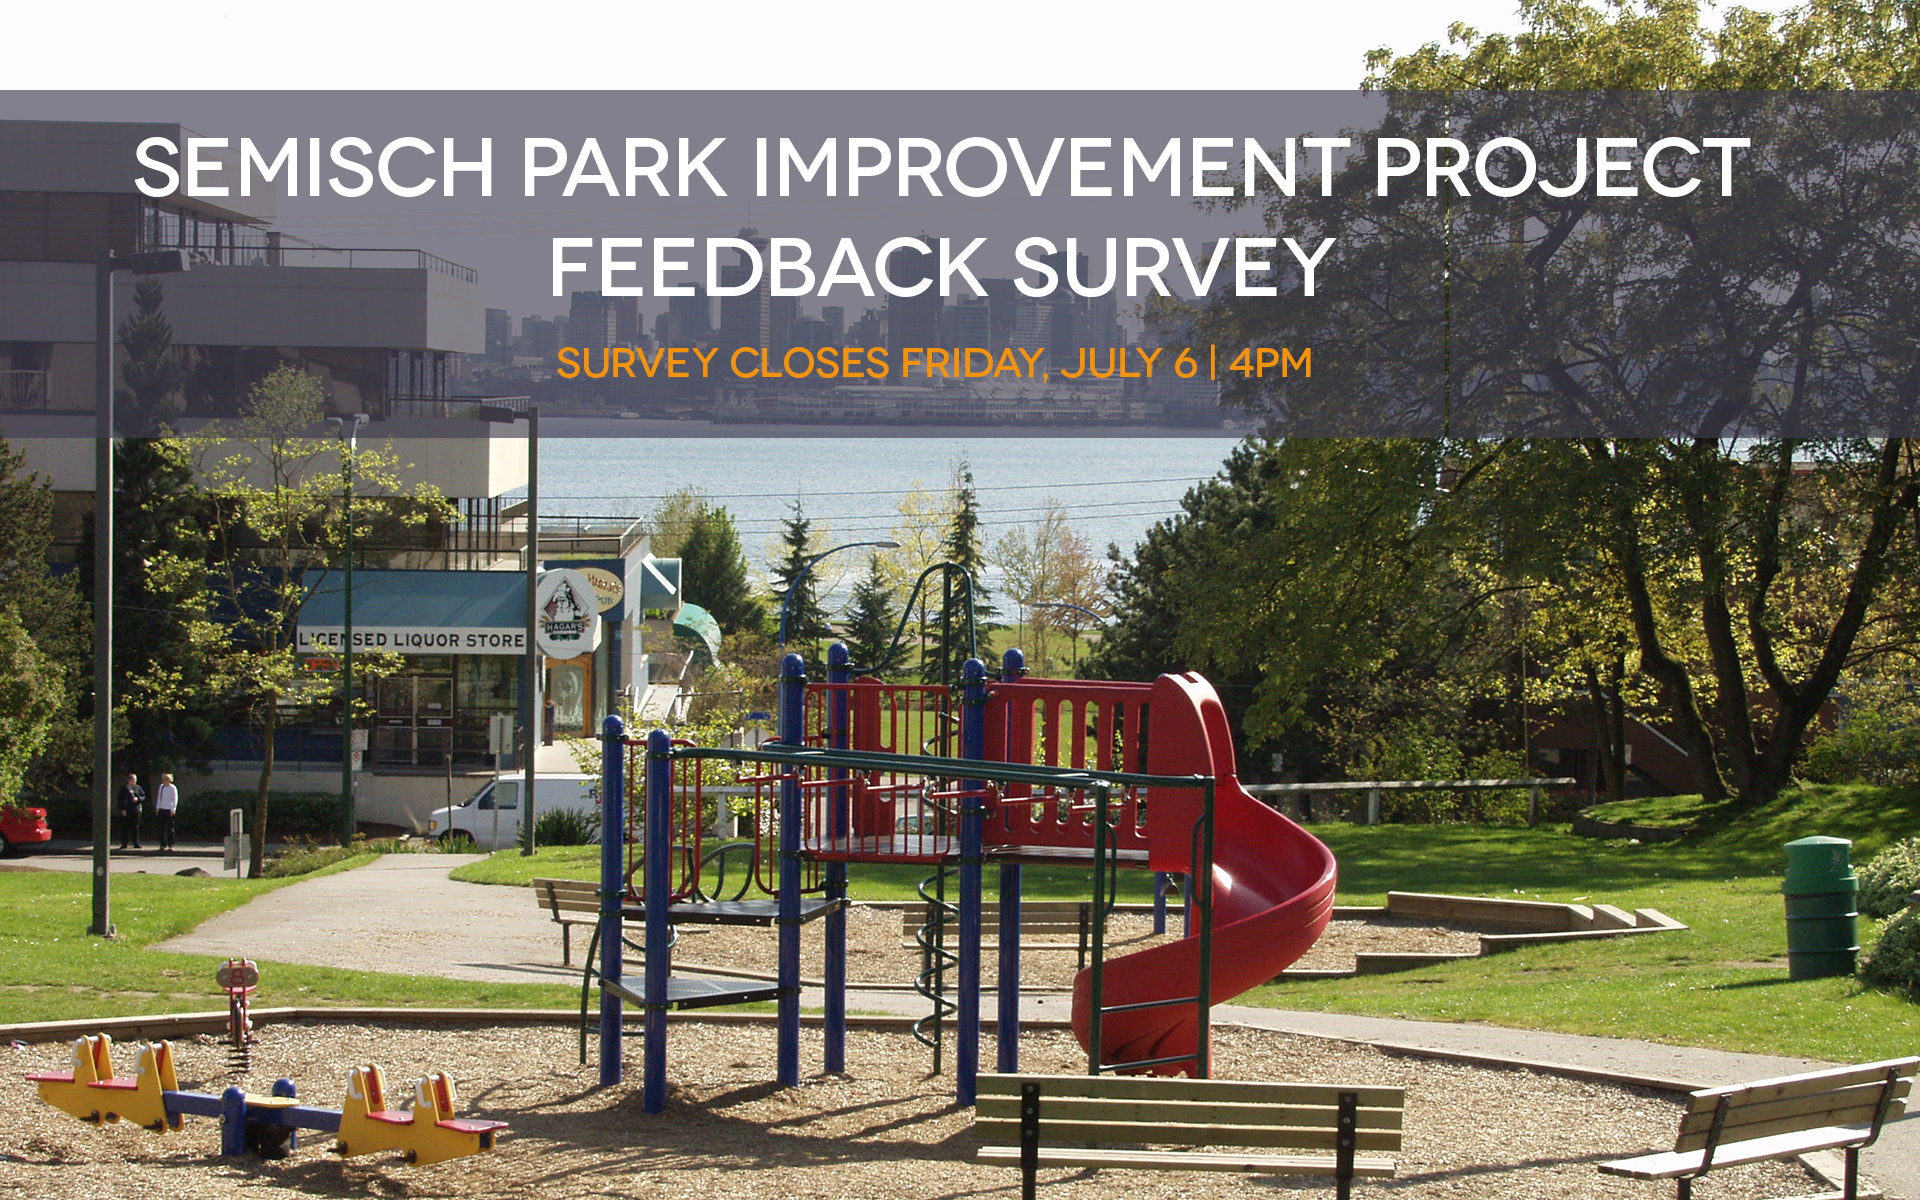 Semisch Park Improvement Survey #2